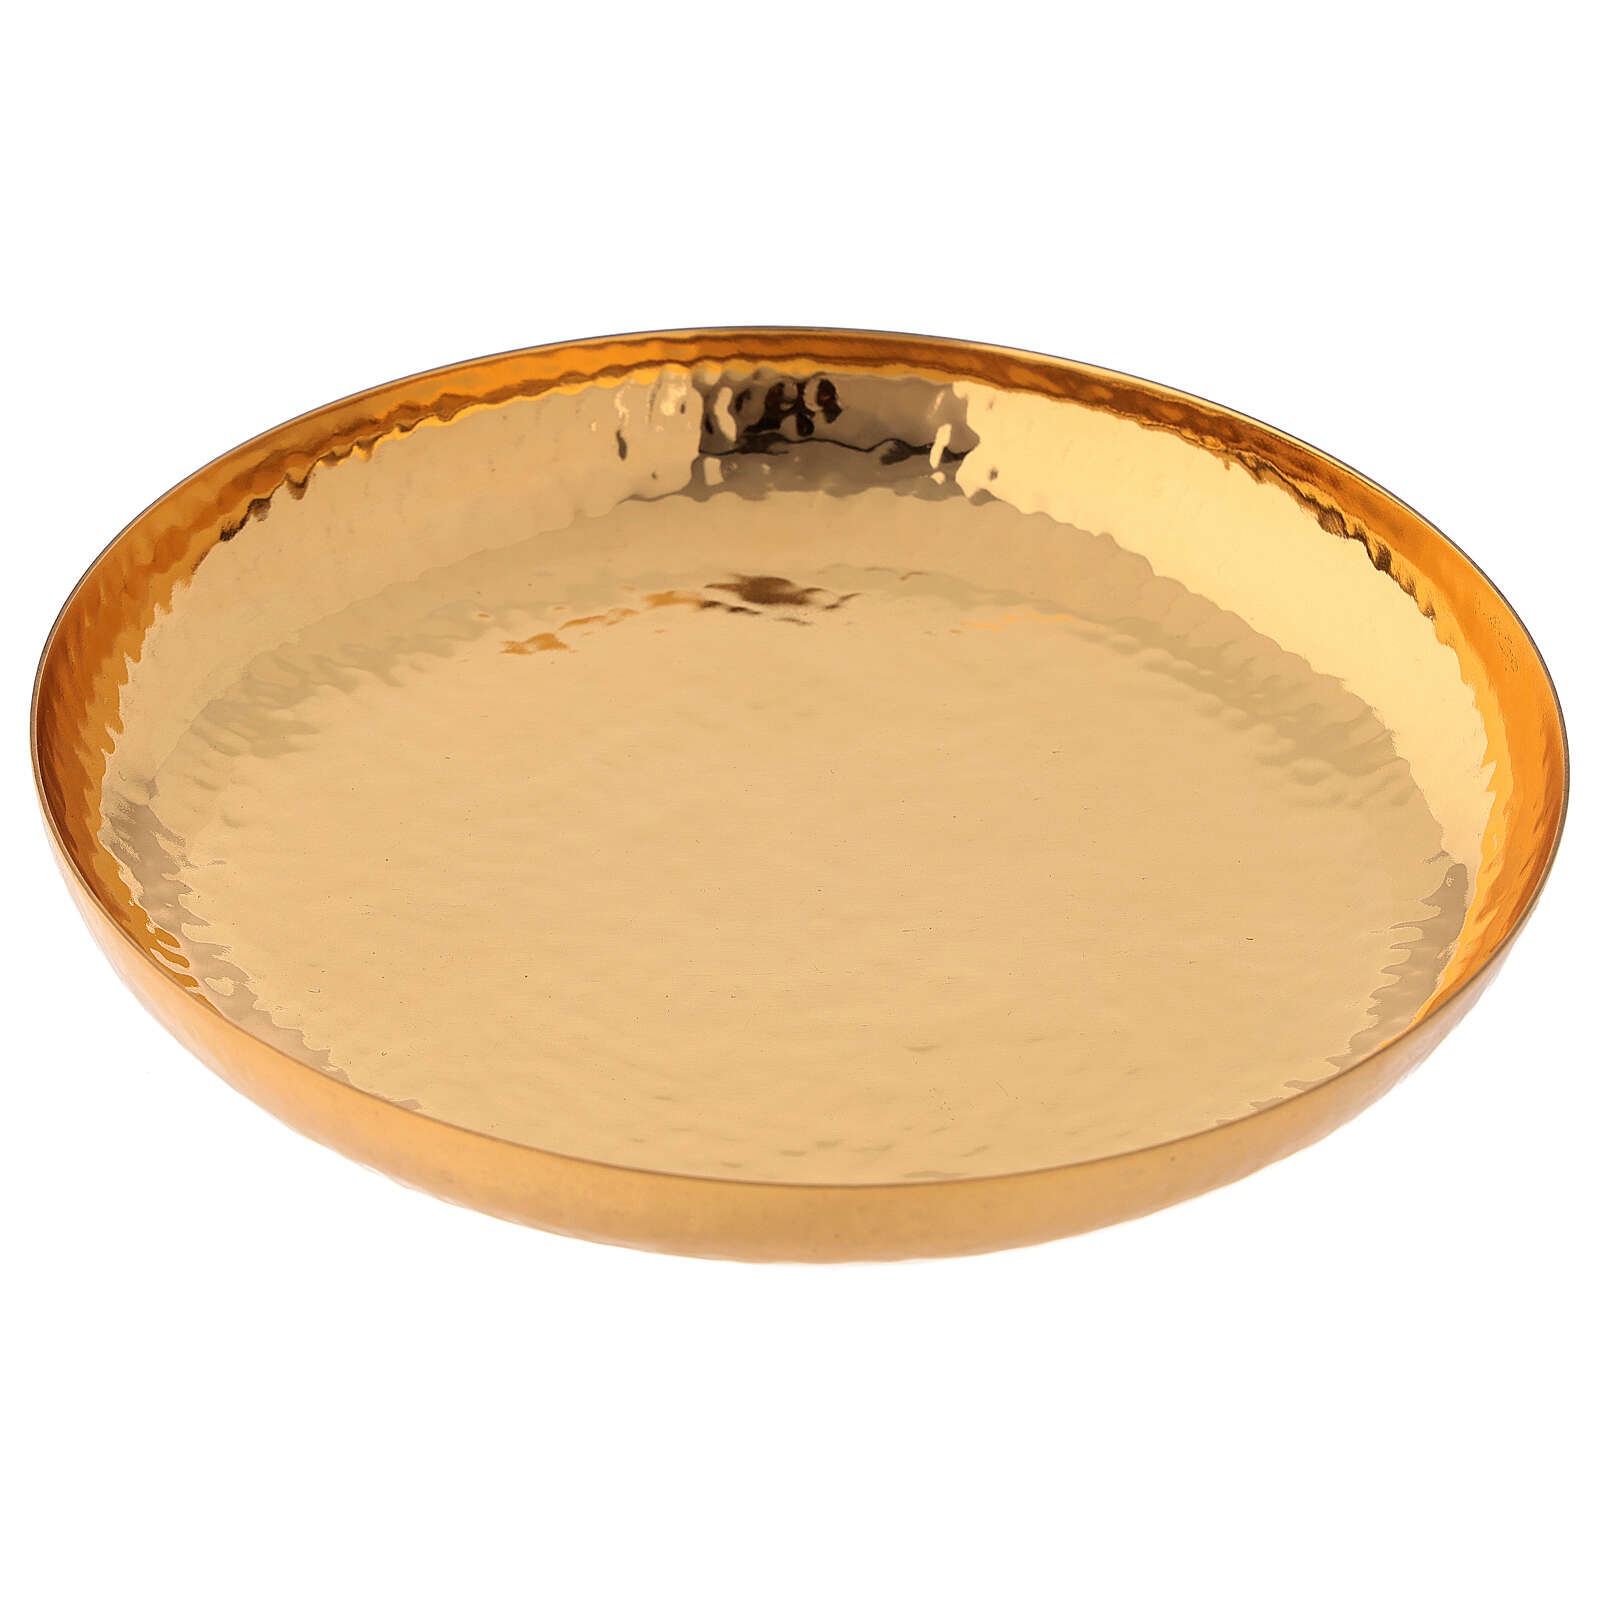 Paten in 24K golden brass, chiseled by hand 4